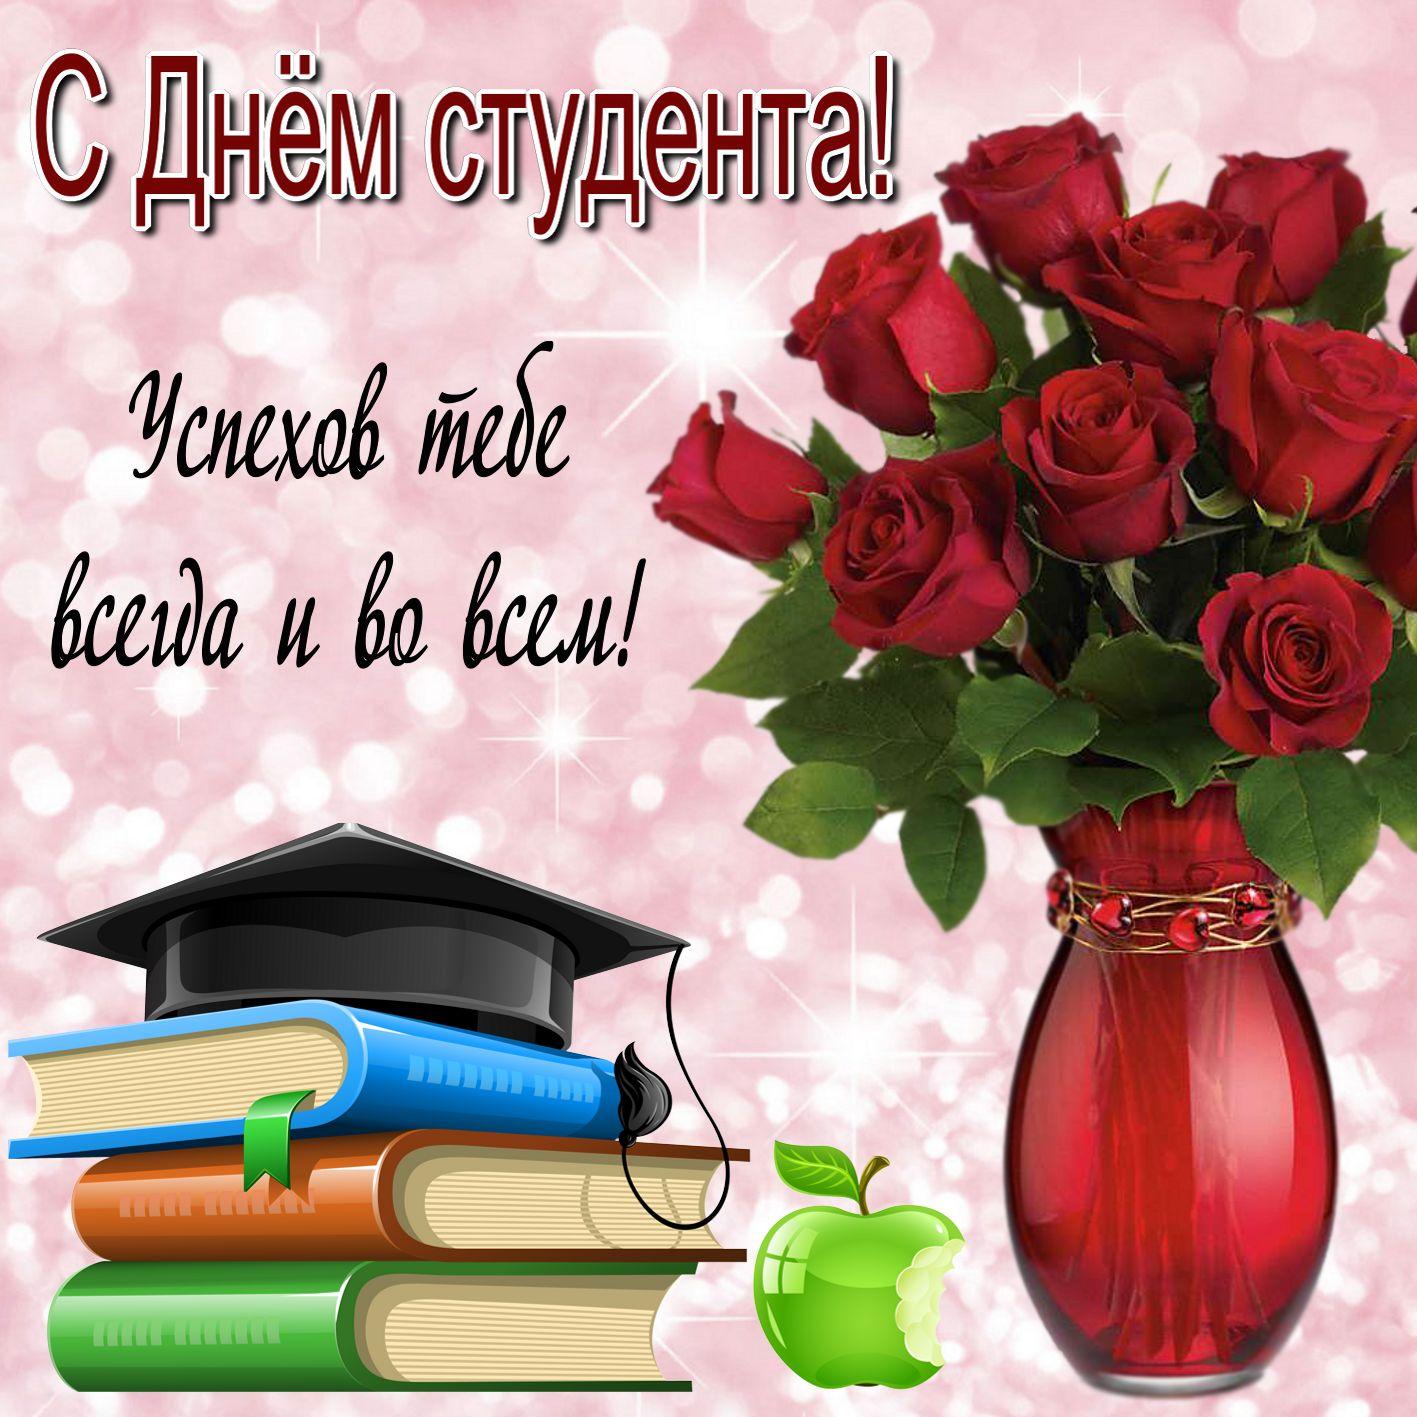 Студента открытки